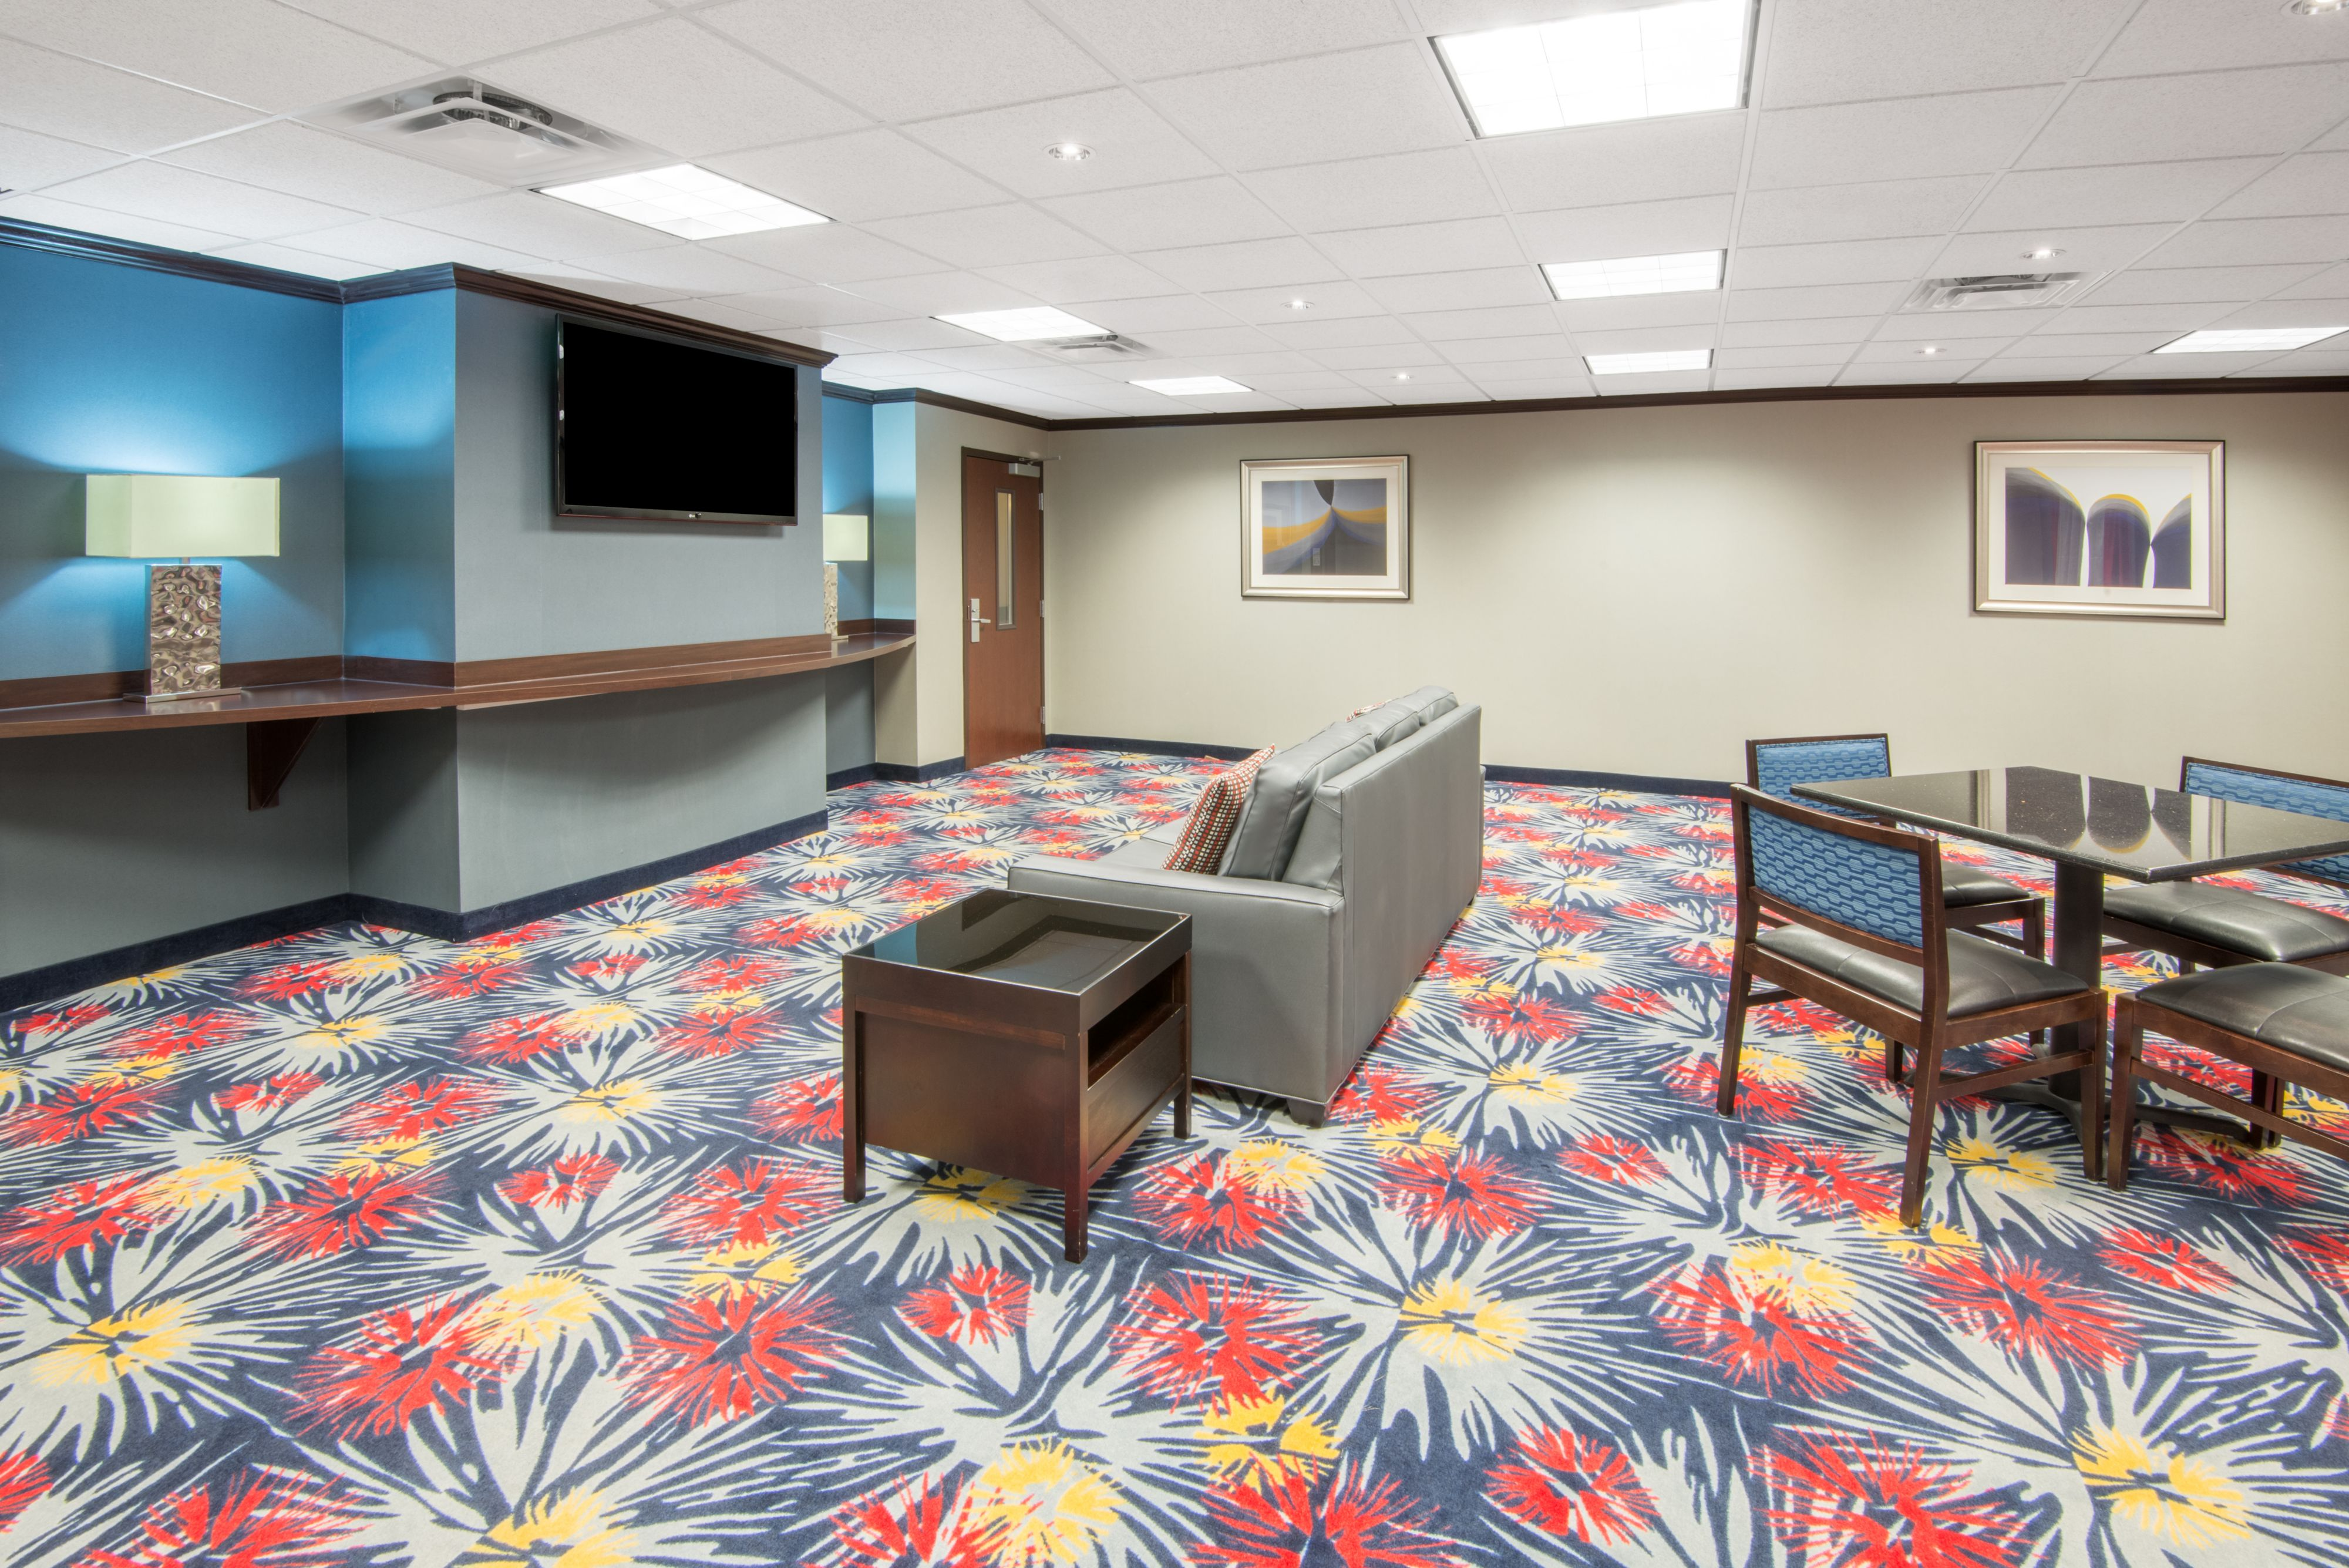 Holiday Inn Express Cleveland Airport - Brook Park image 4